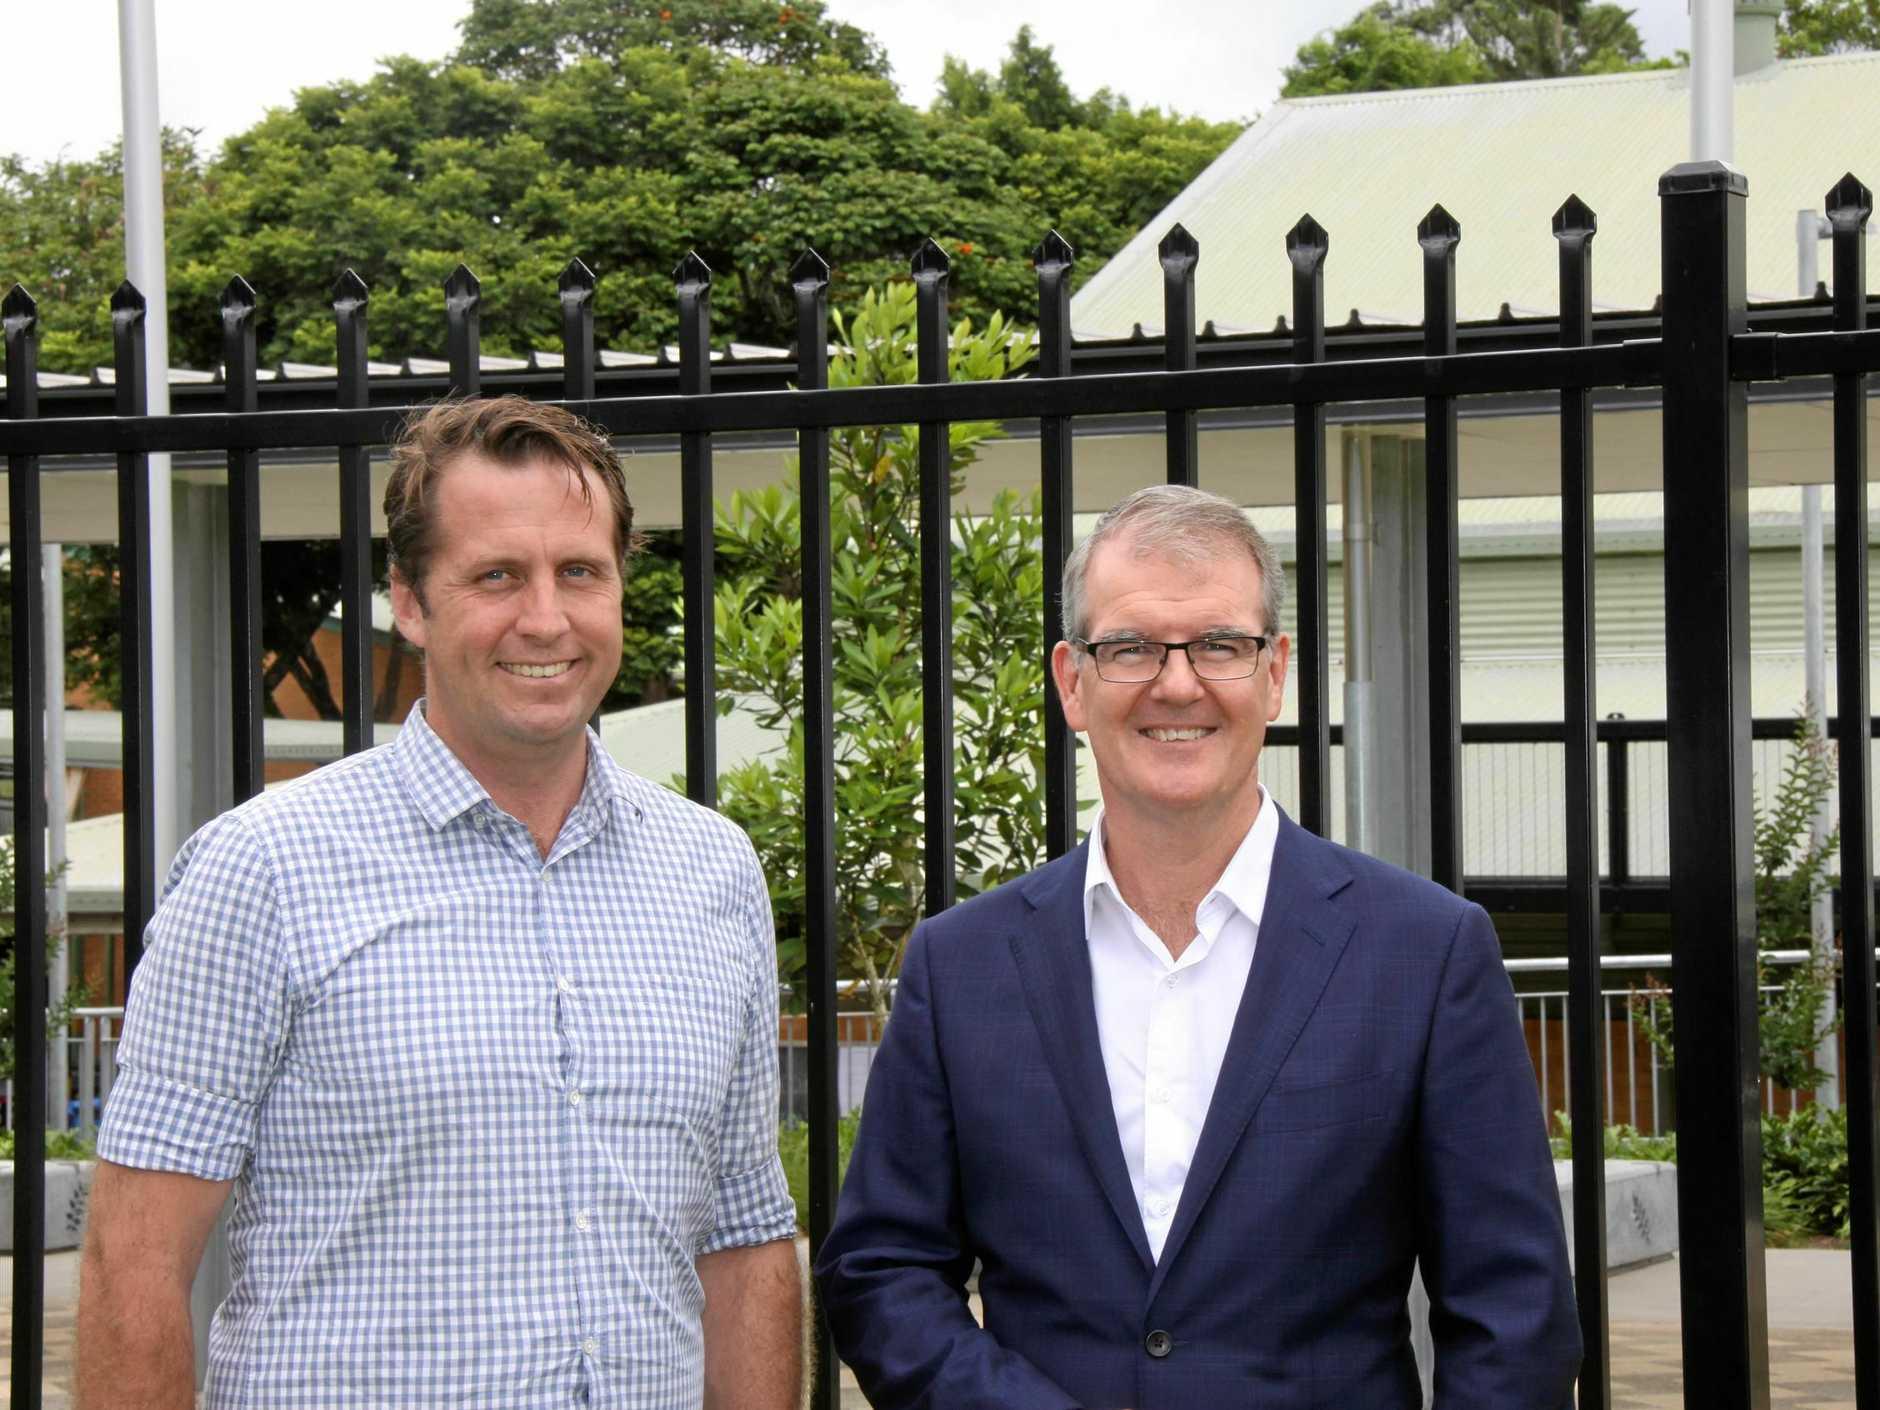 DRUG SUMMIT: Ballina Labor candidates Asren Pugh with state Labour leader Micahel Dalley MP.